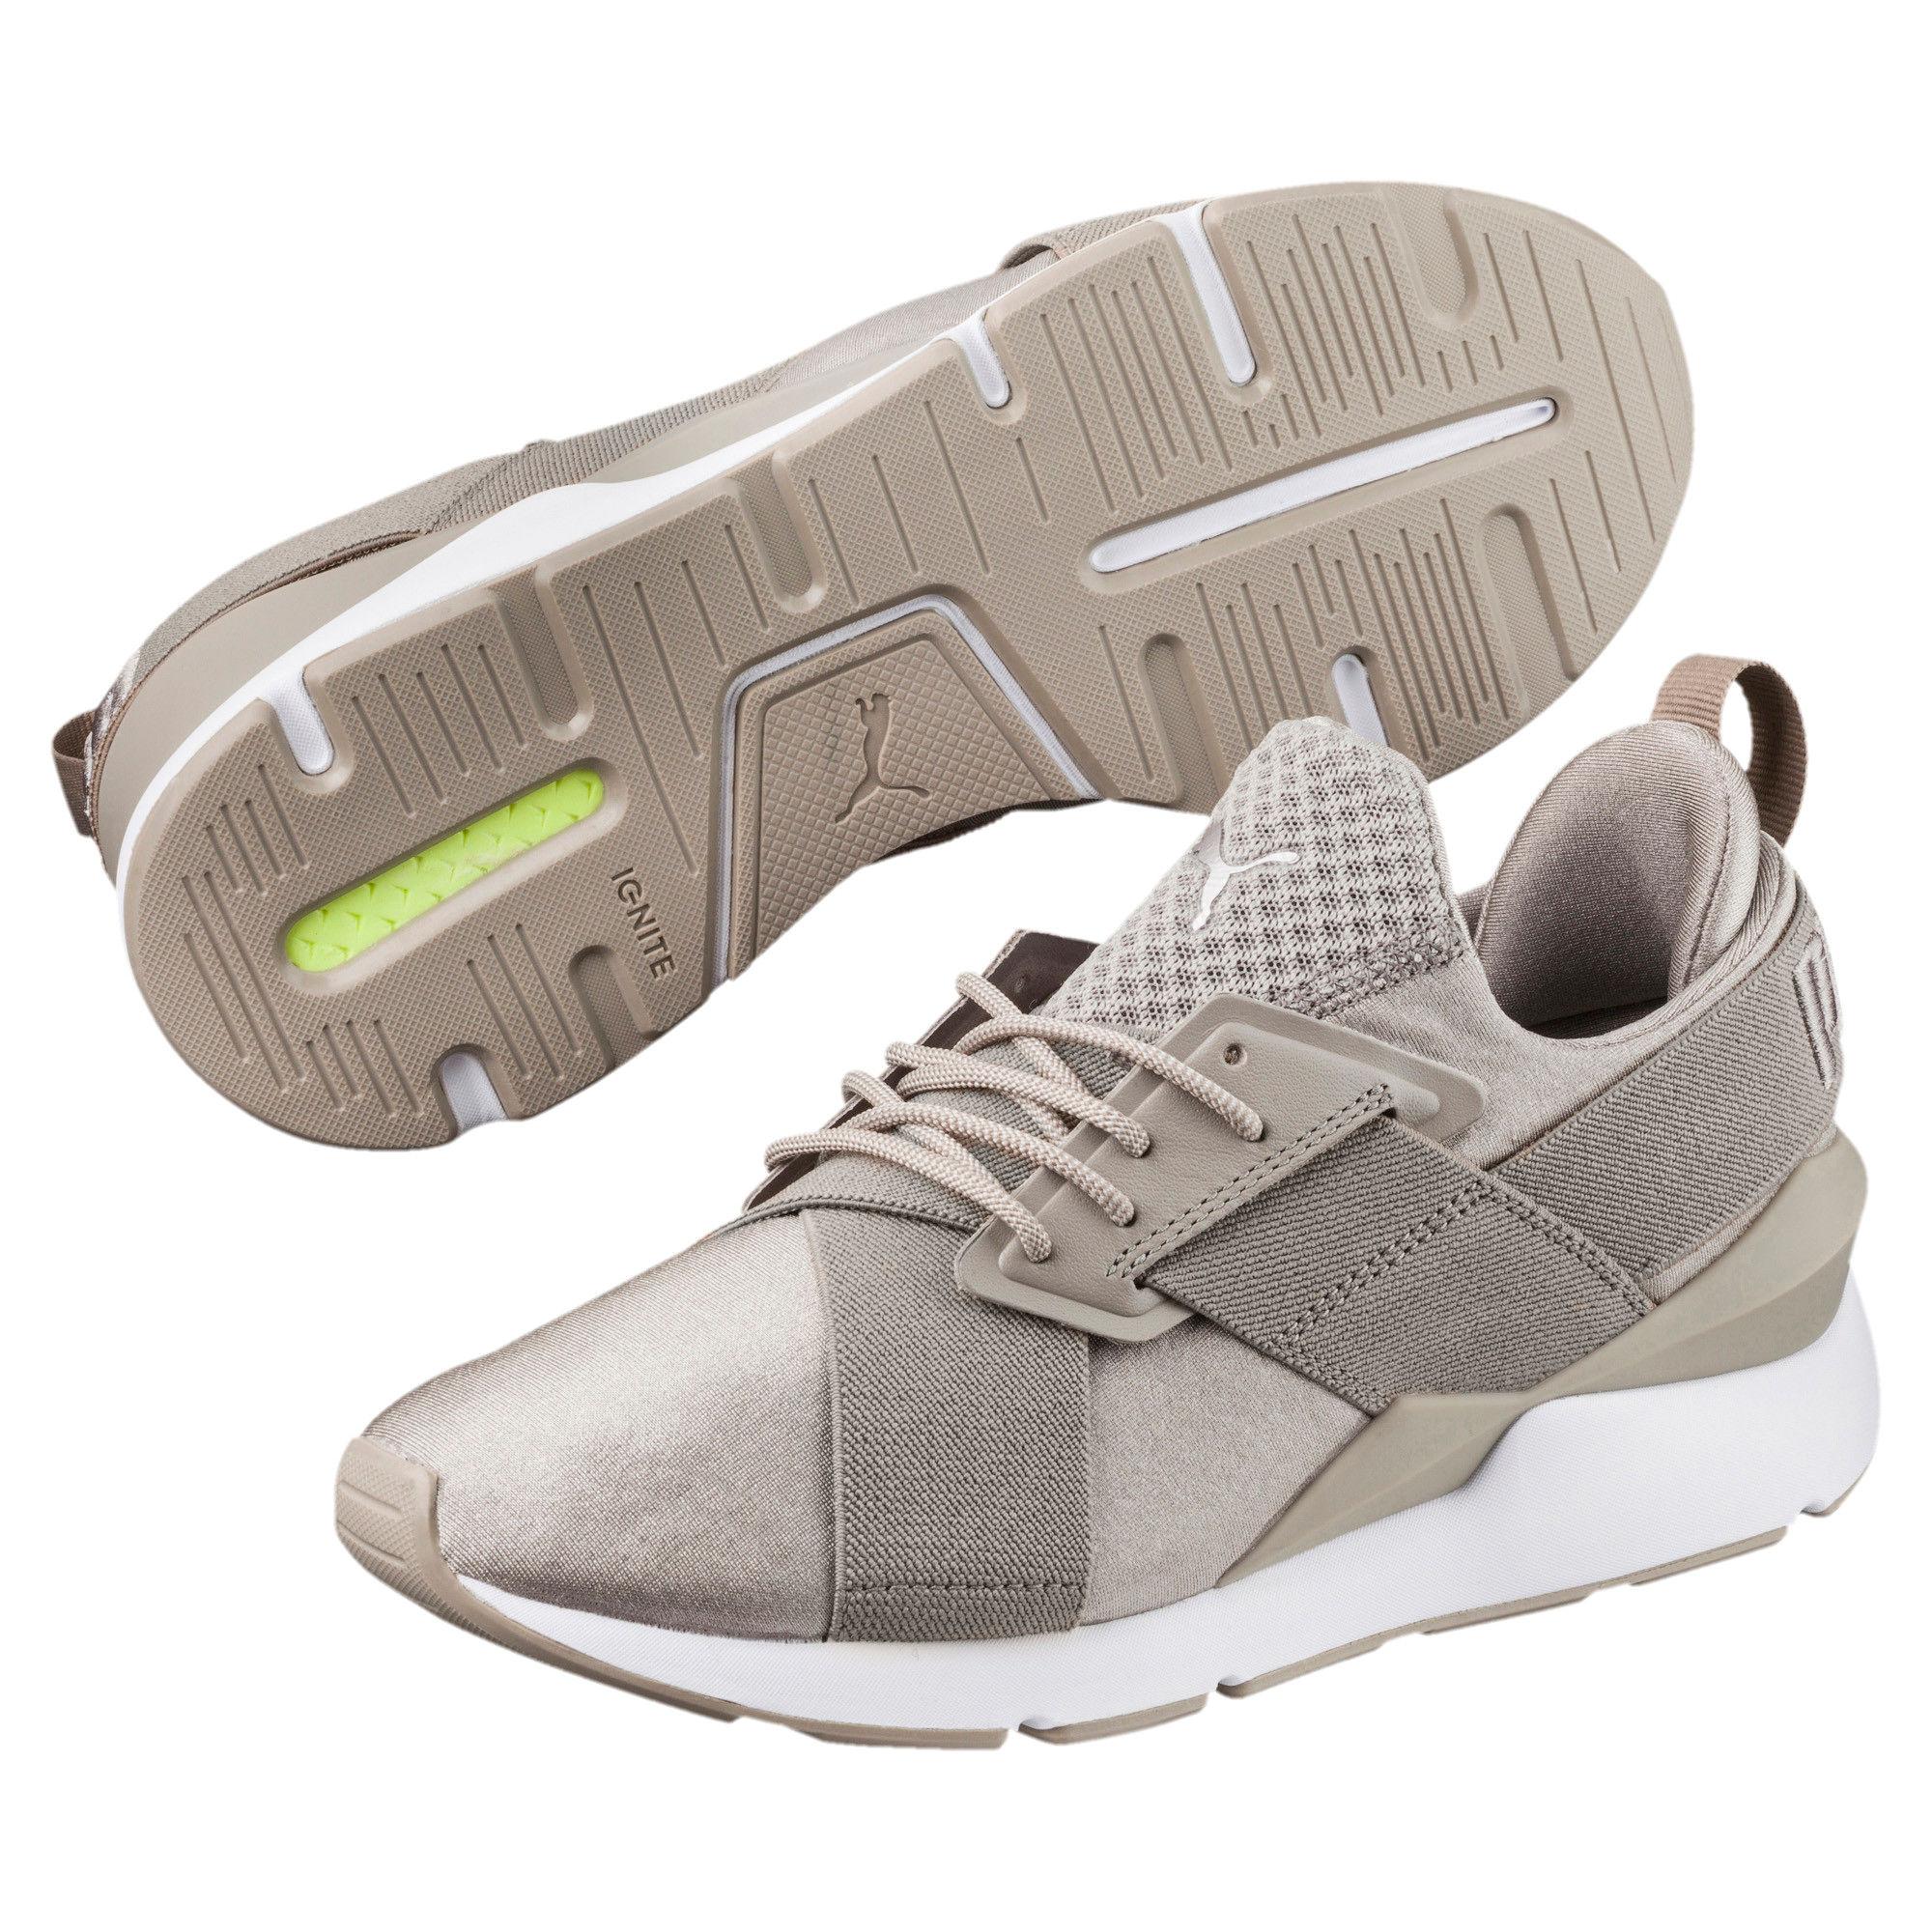 Puma Muse Satin Ep Wn'S Sneaker: Buy